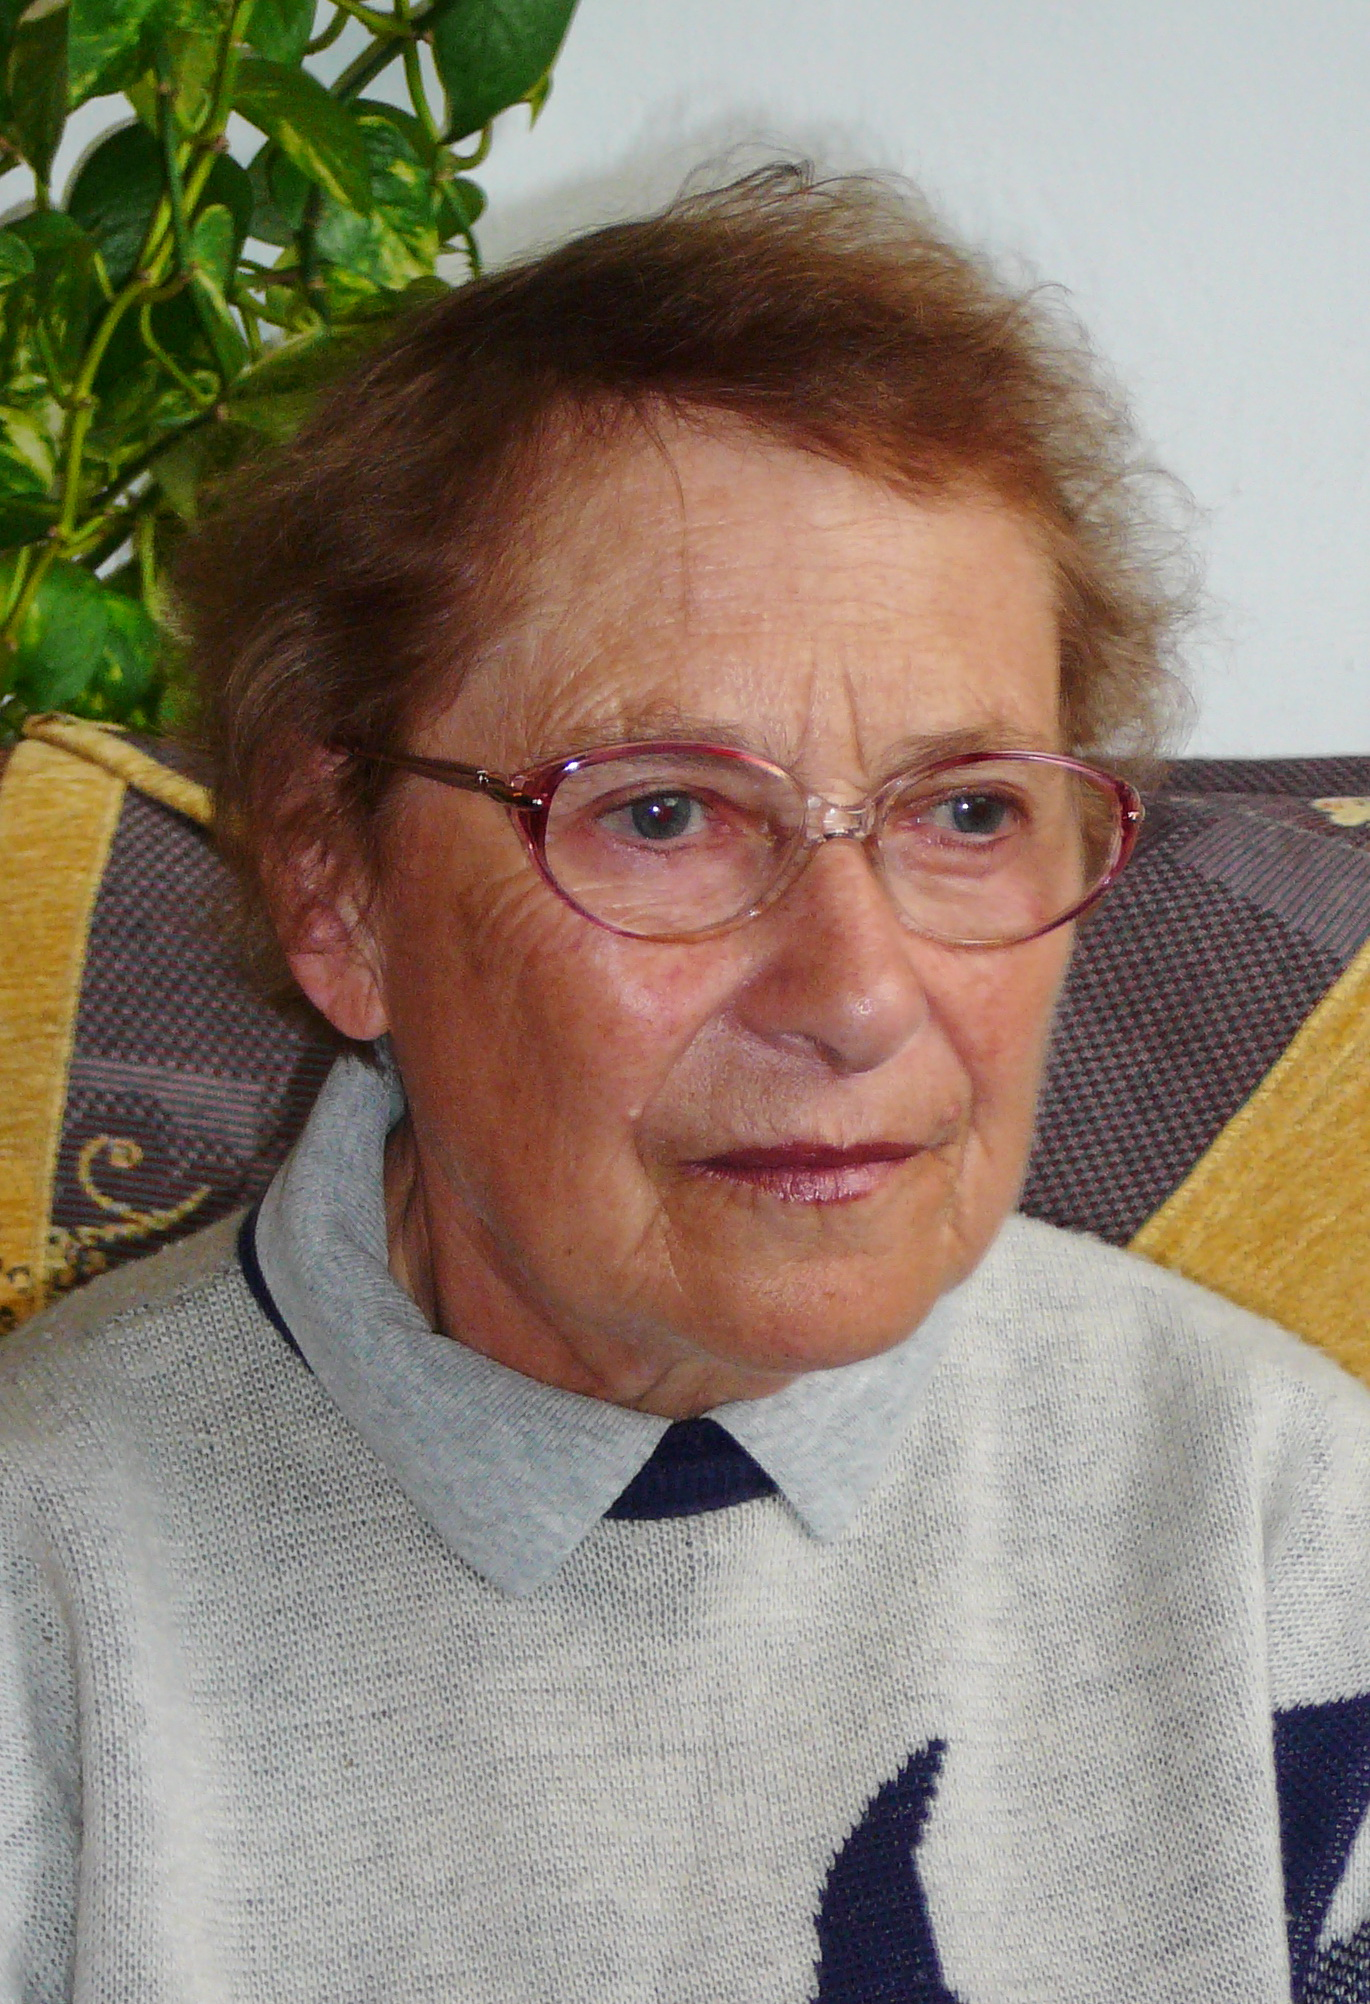 kniga-book, Достояние, Инна Кенигсберг